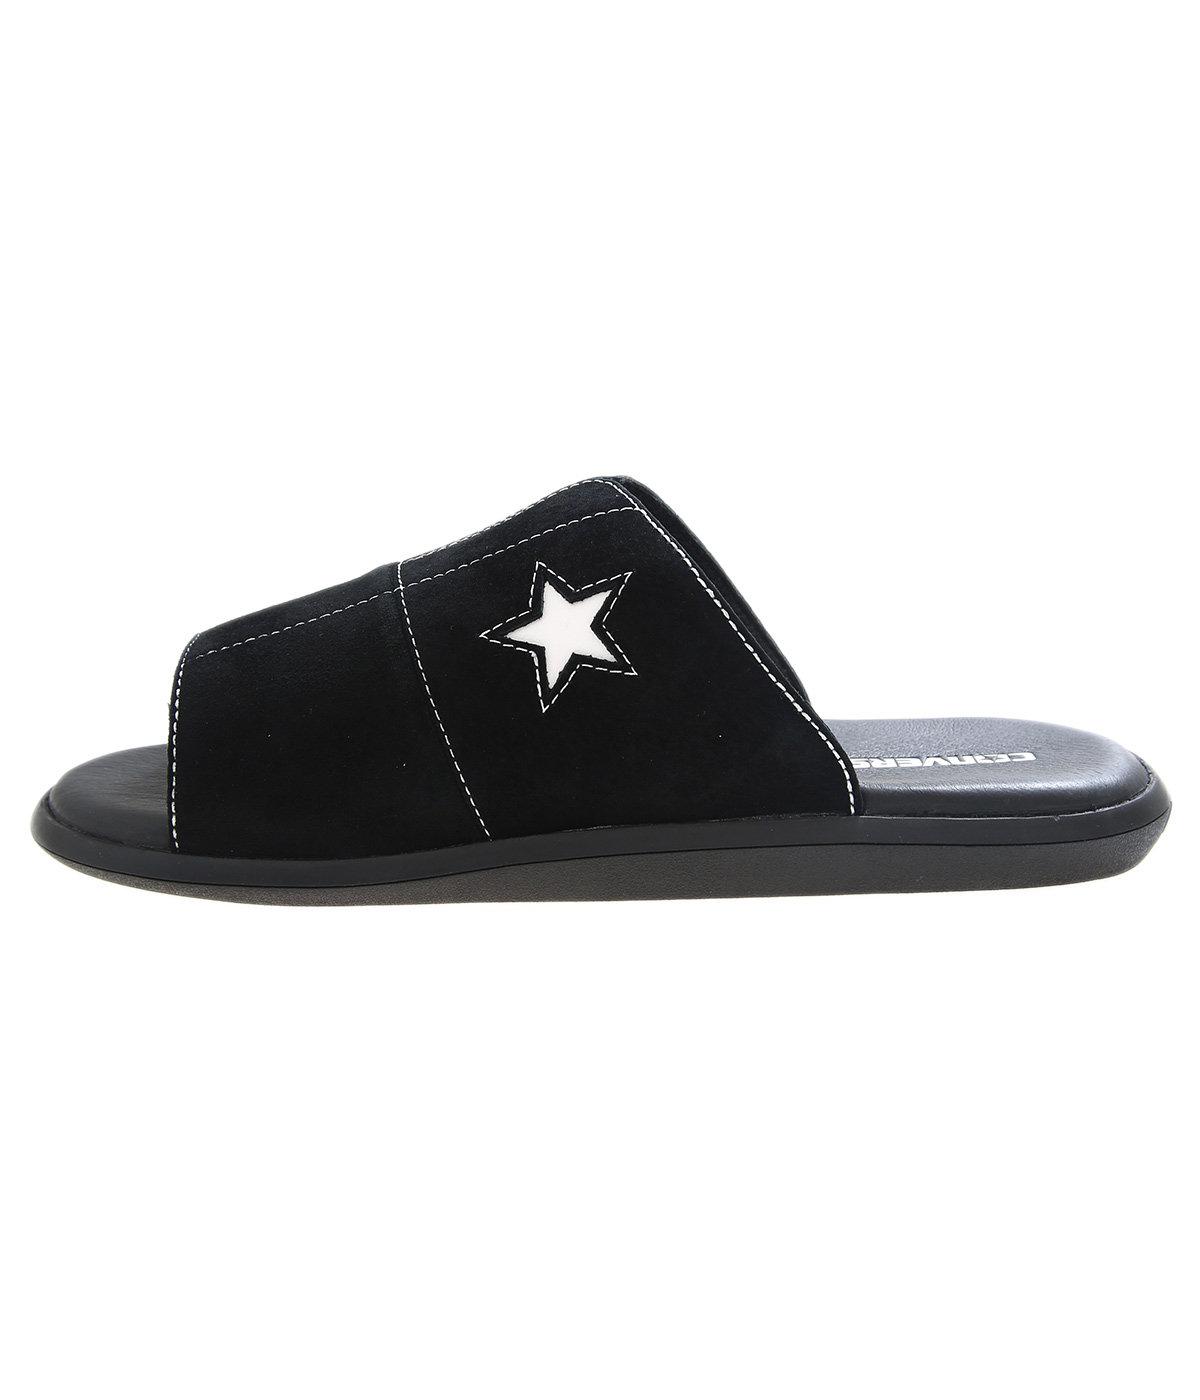 ONE STAR SANDAL